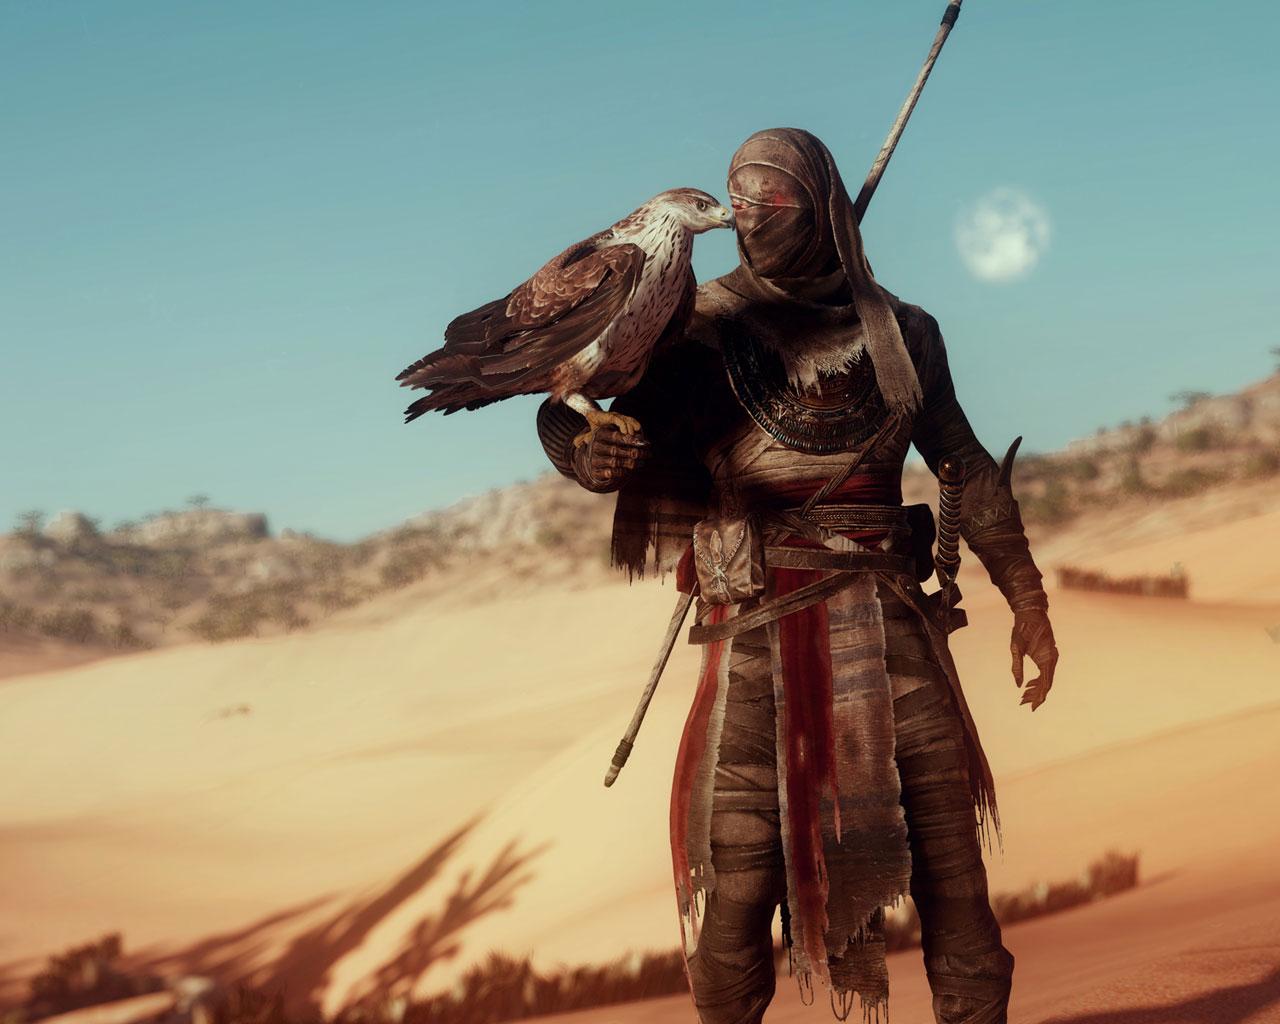 Free Assassin's Creed Origins Wallpaper in 1280x1024